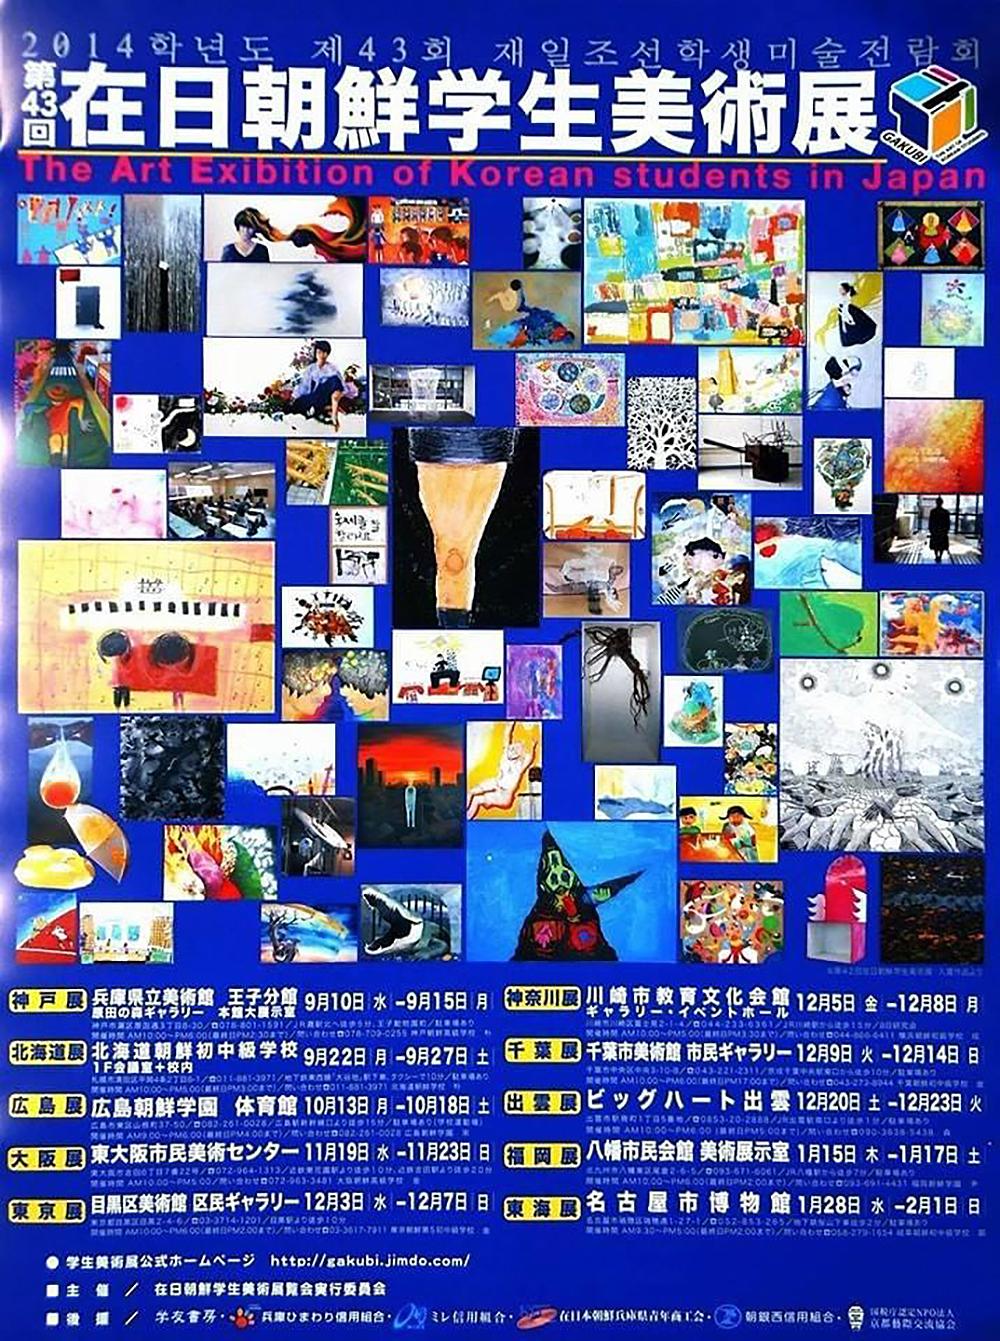 第43回(2014年度)